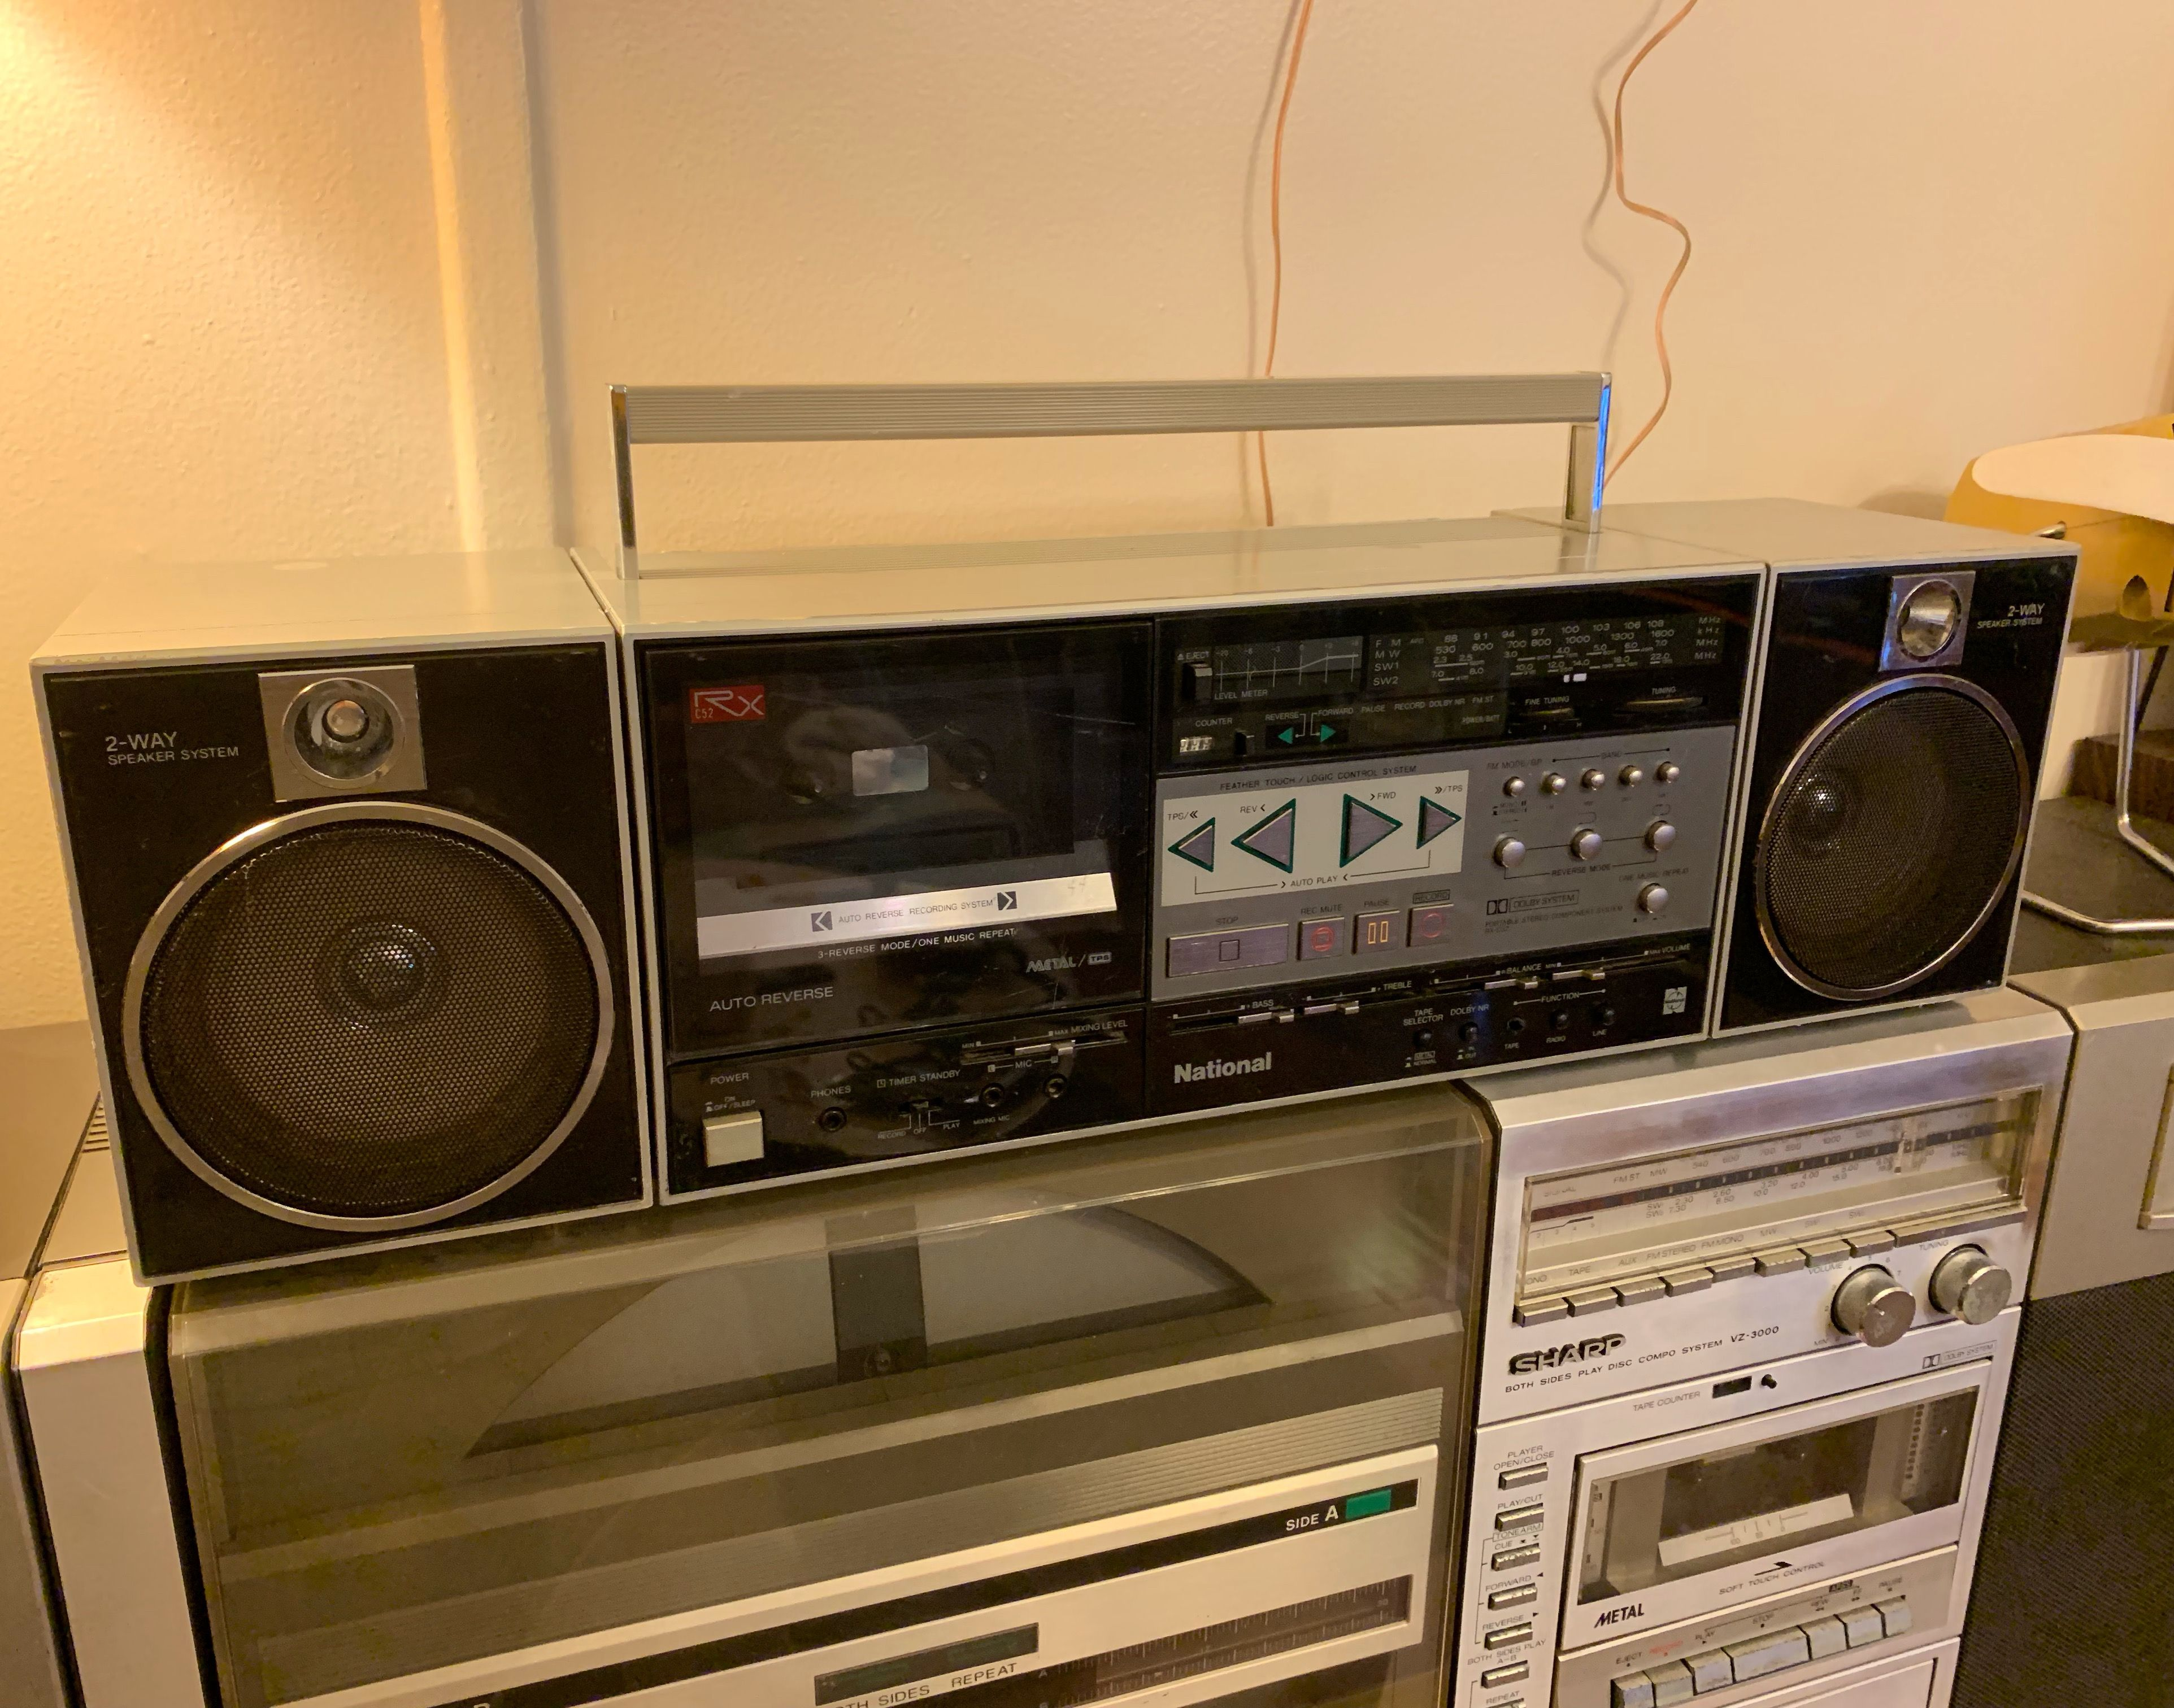 National Rx C52 Boombox Ghettoblaster Boombox Radio Cassette Hifi